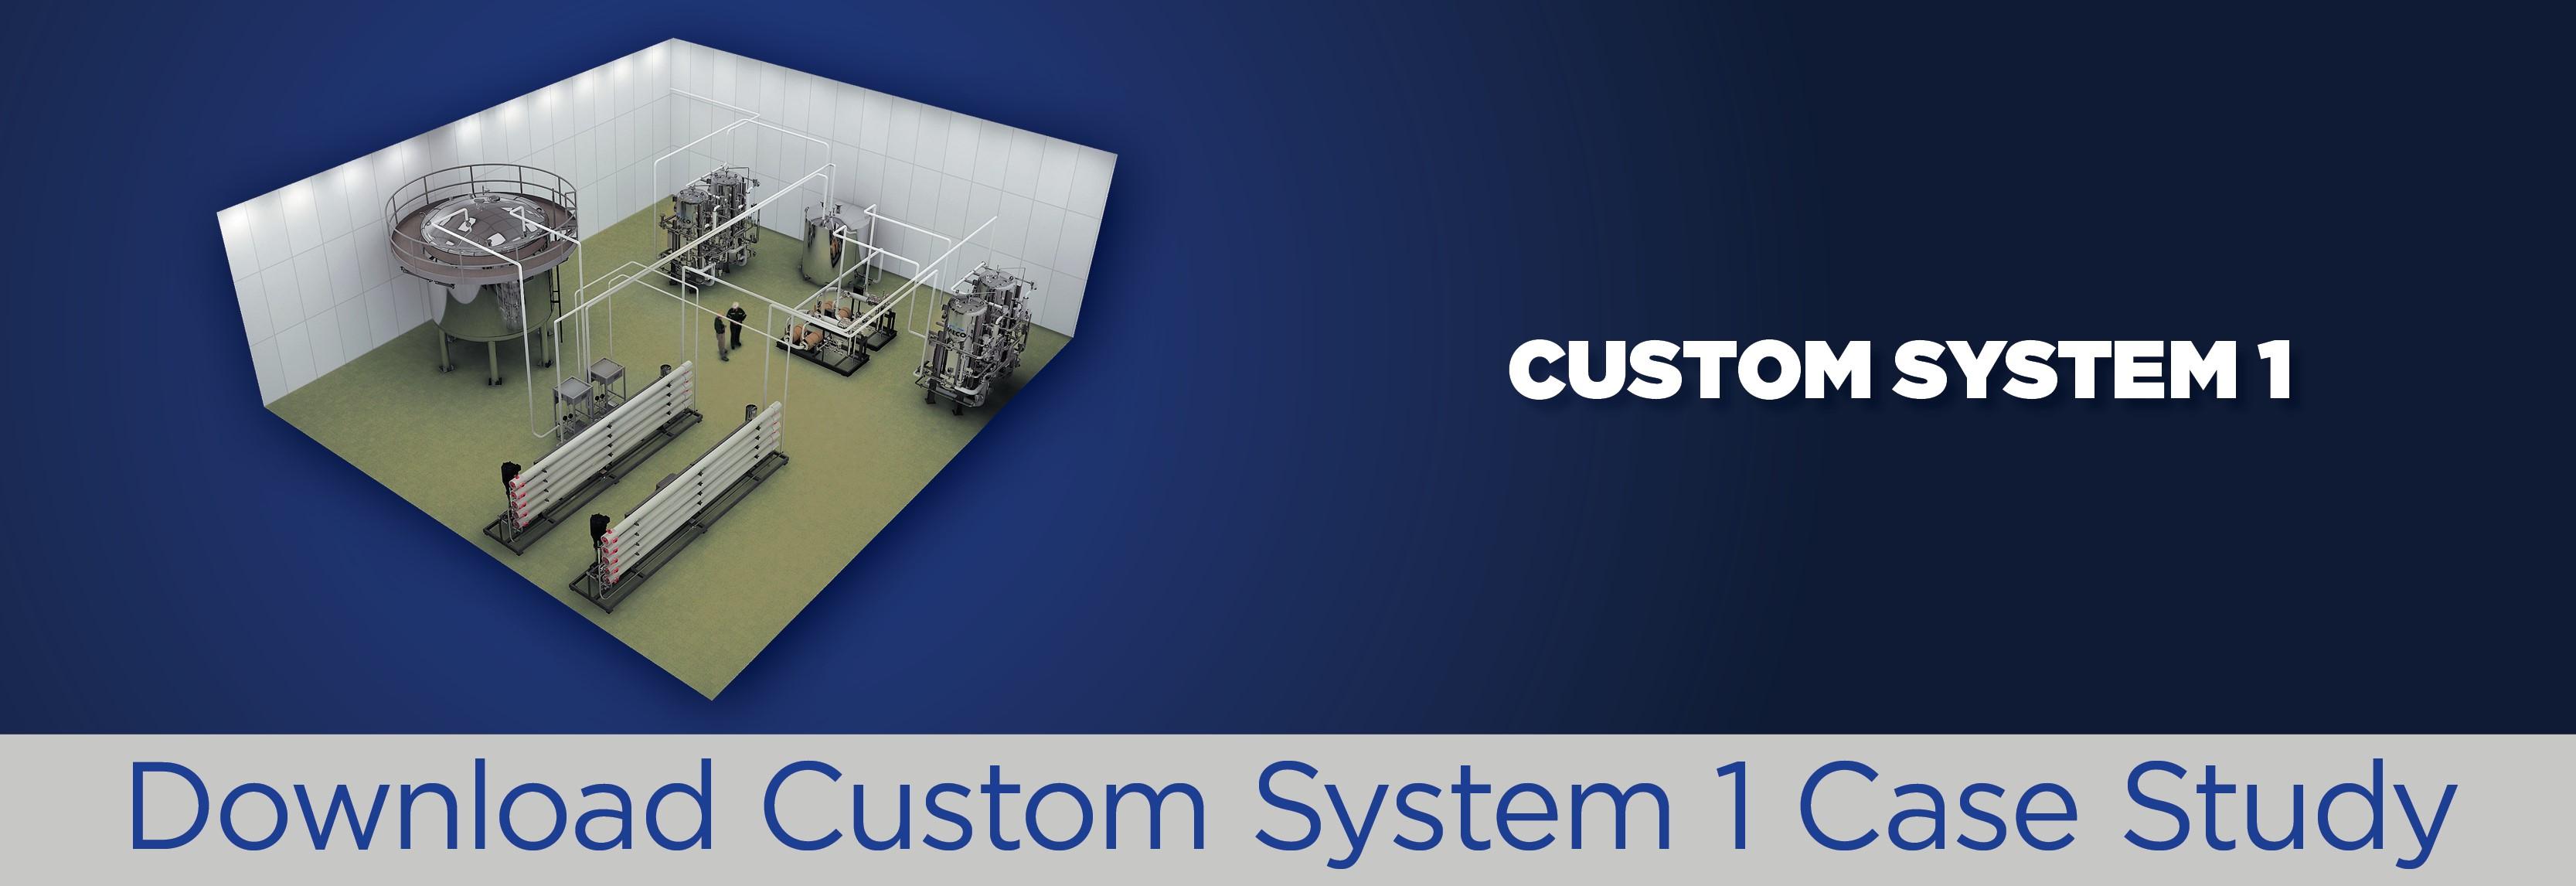 Lander Banner_Custom System 1_Case Study.jpg